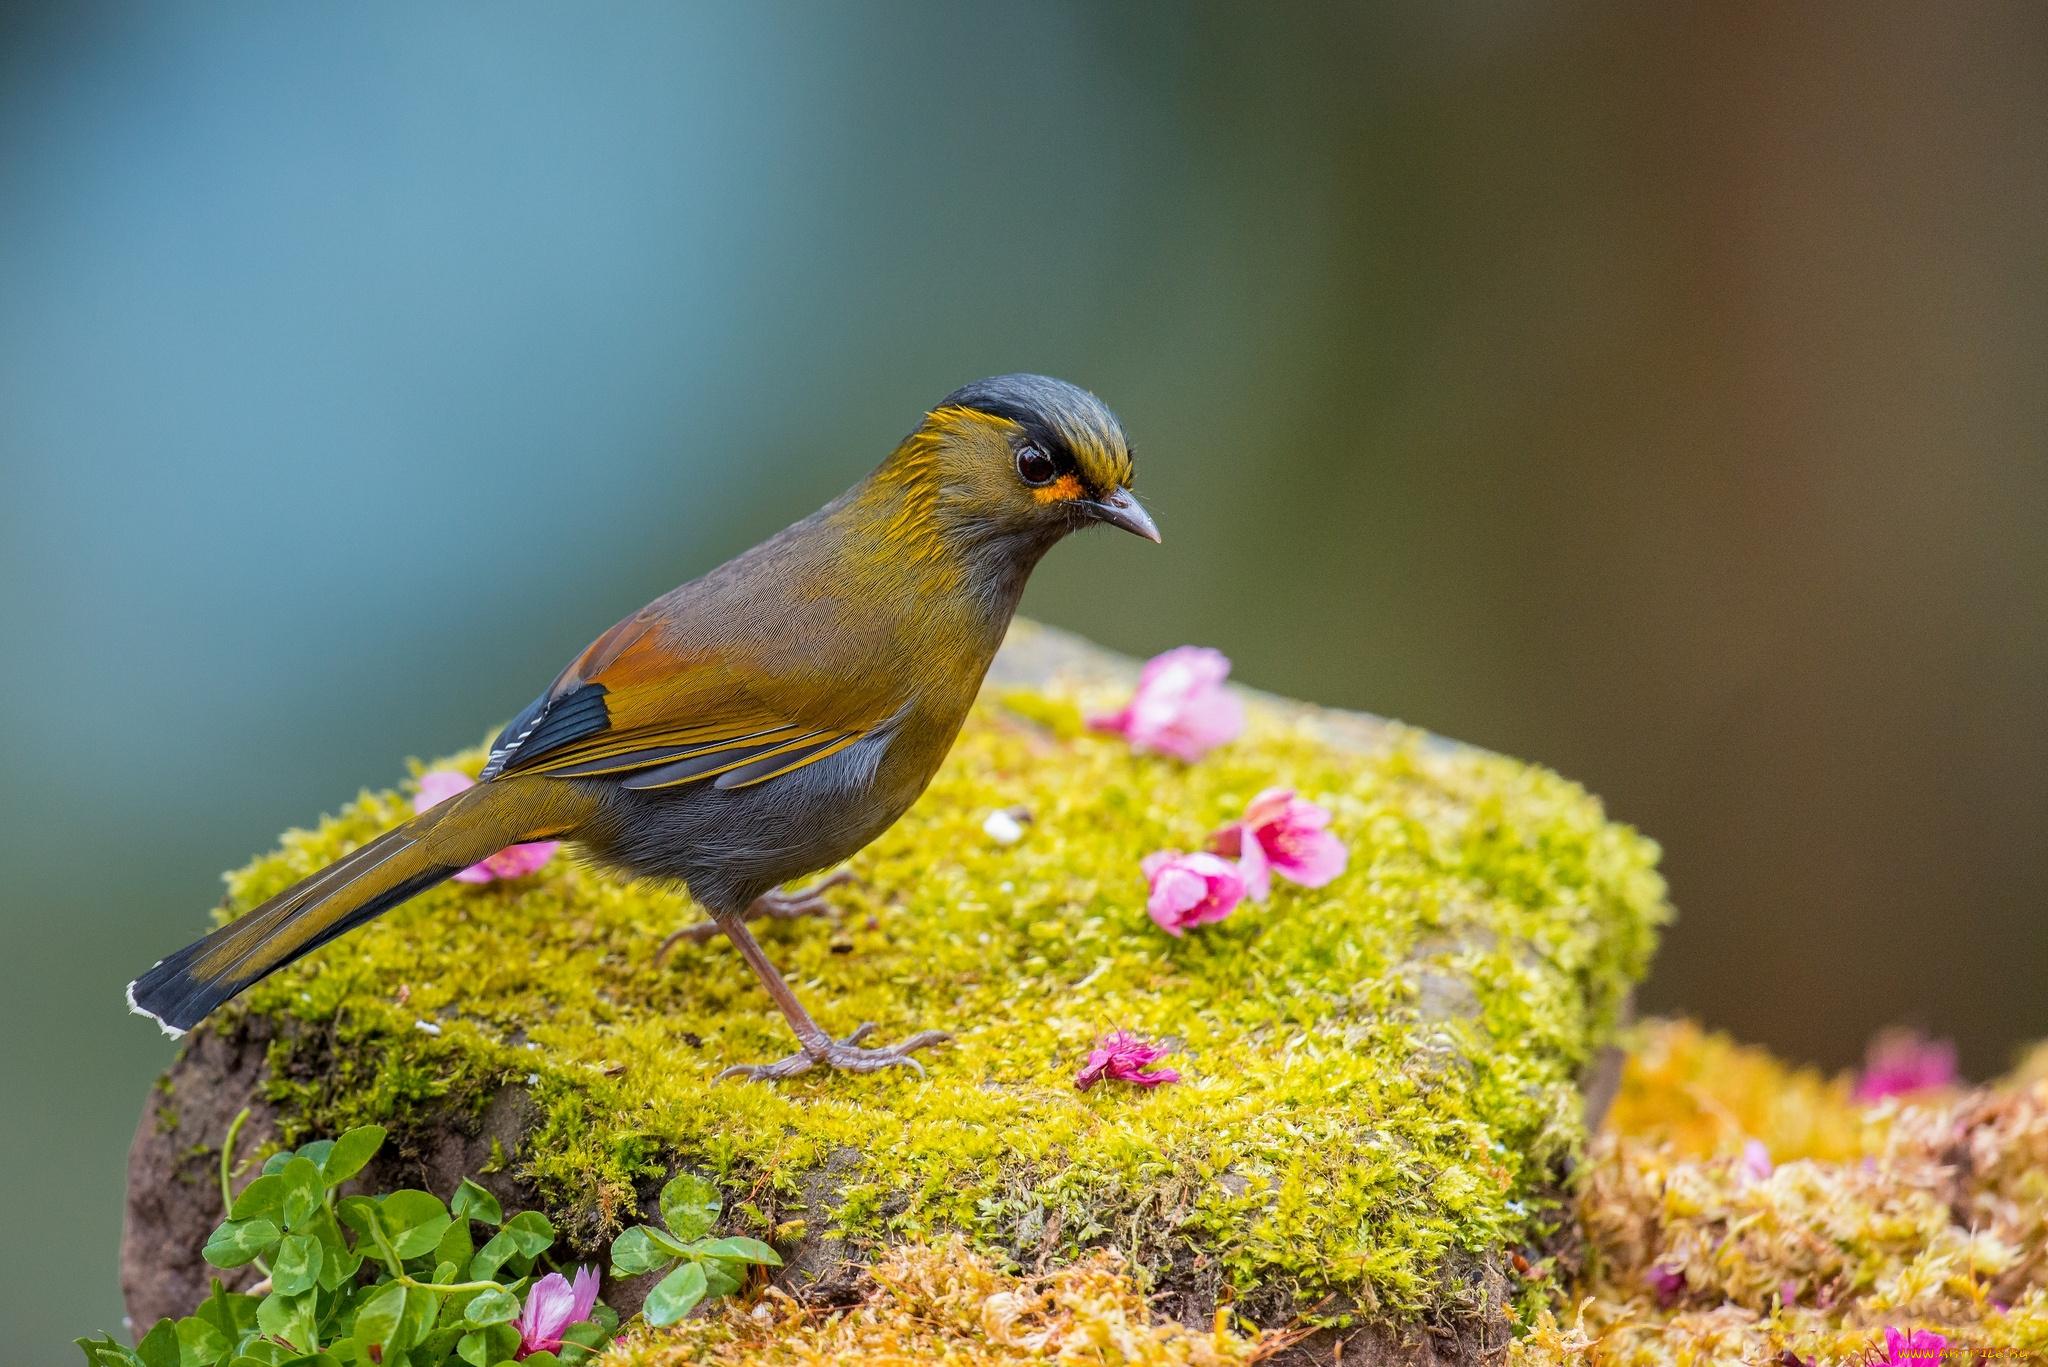 Желтая птичка на мхе бесплатно